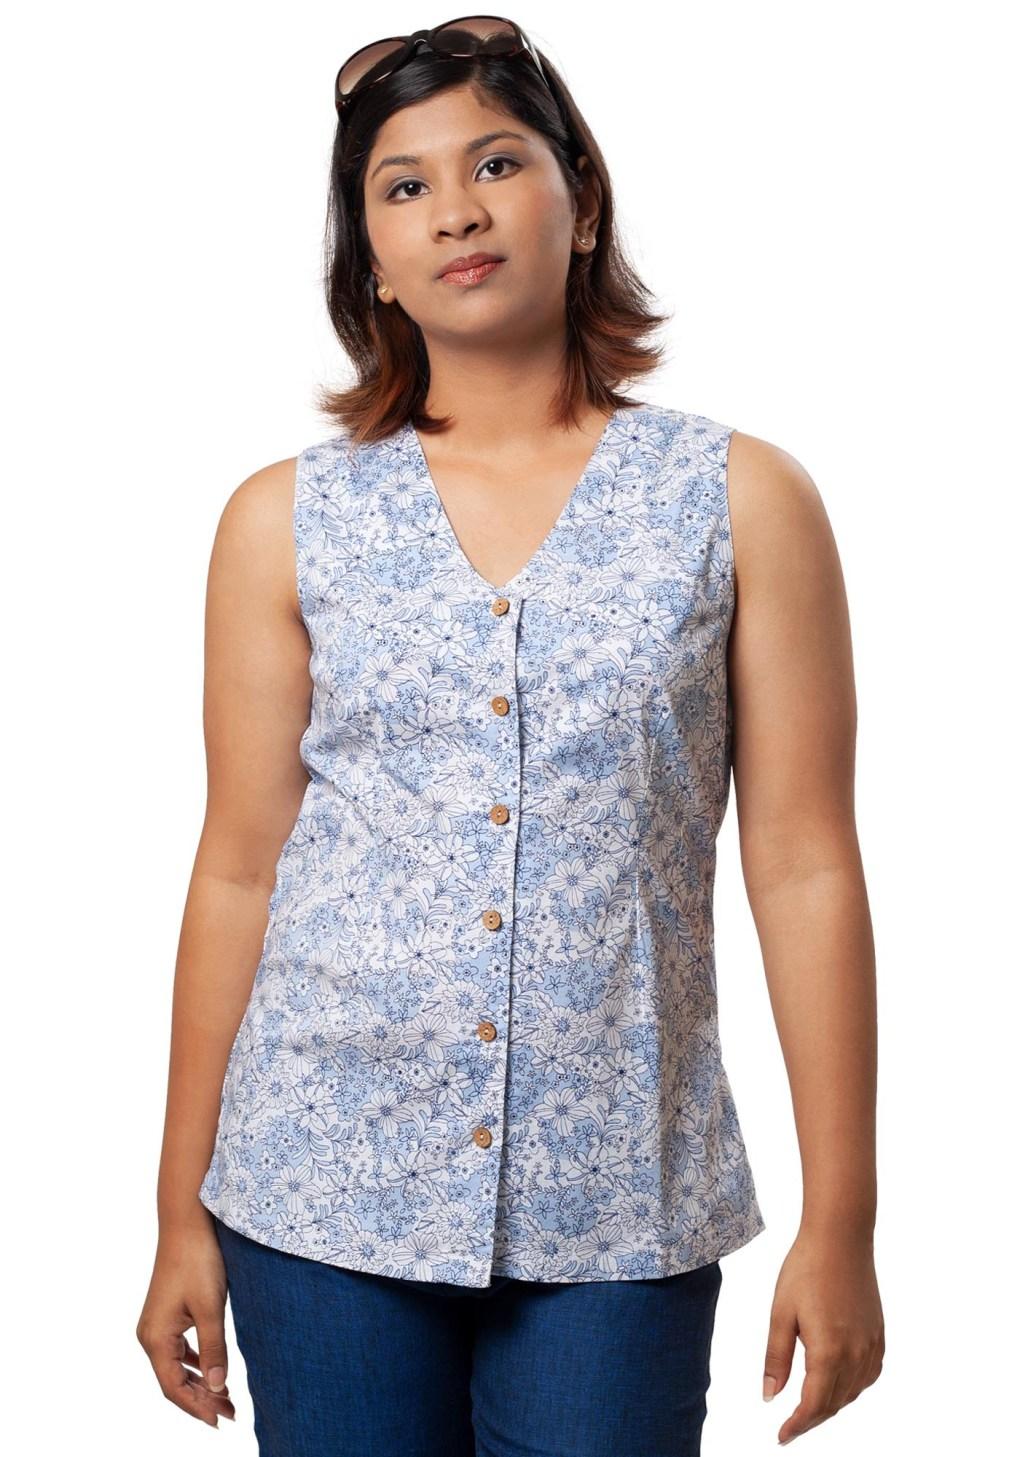 MINC ecofashion Slim Fit V-Neck Shirt in Printed White Cotton